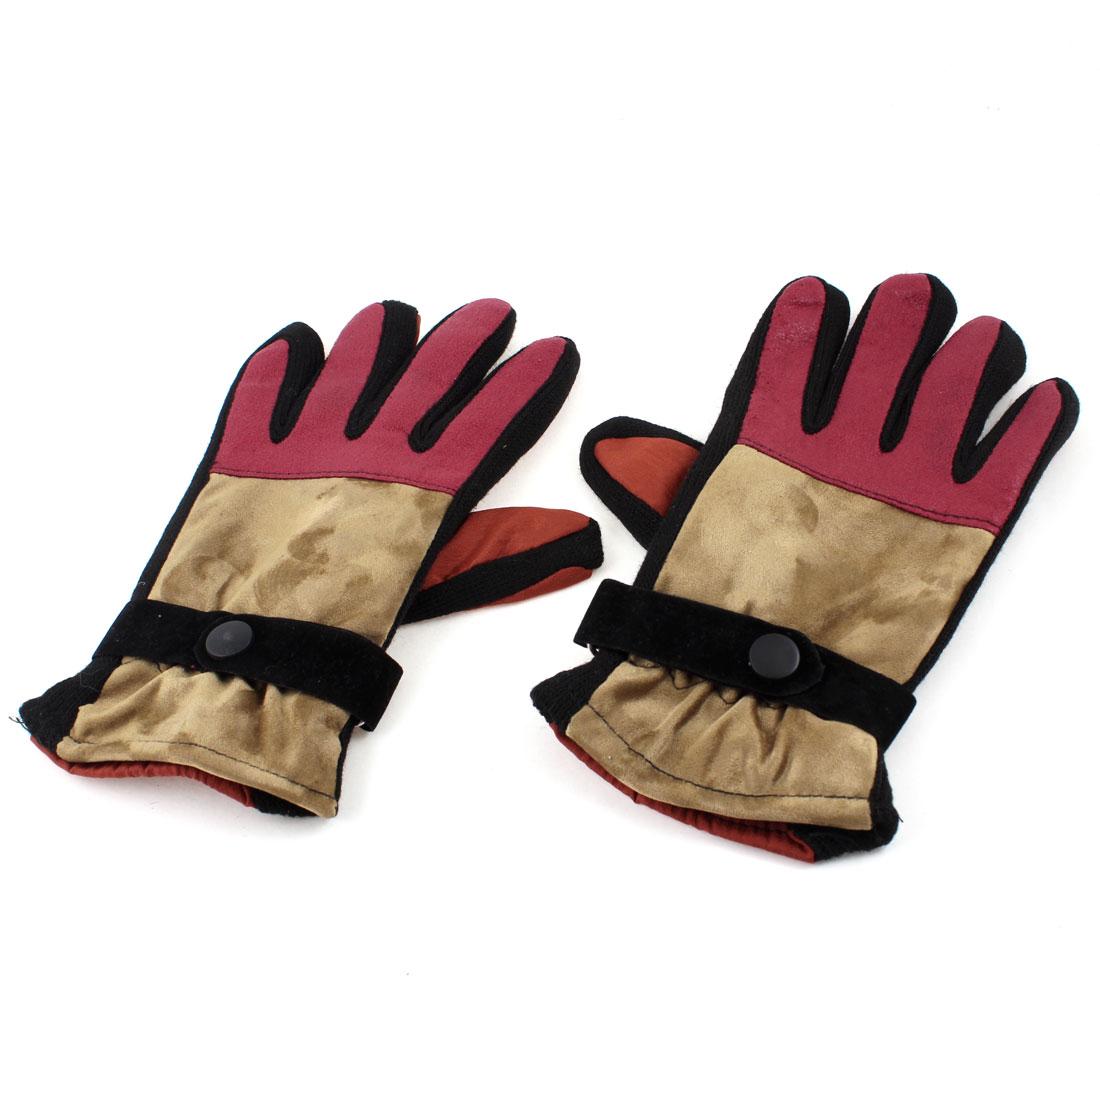 Lady Winter Press Button Riding Full Finger Fuchsia Orange Warm Gloves Pair